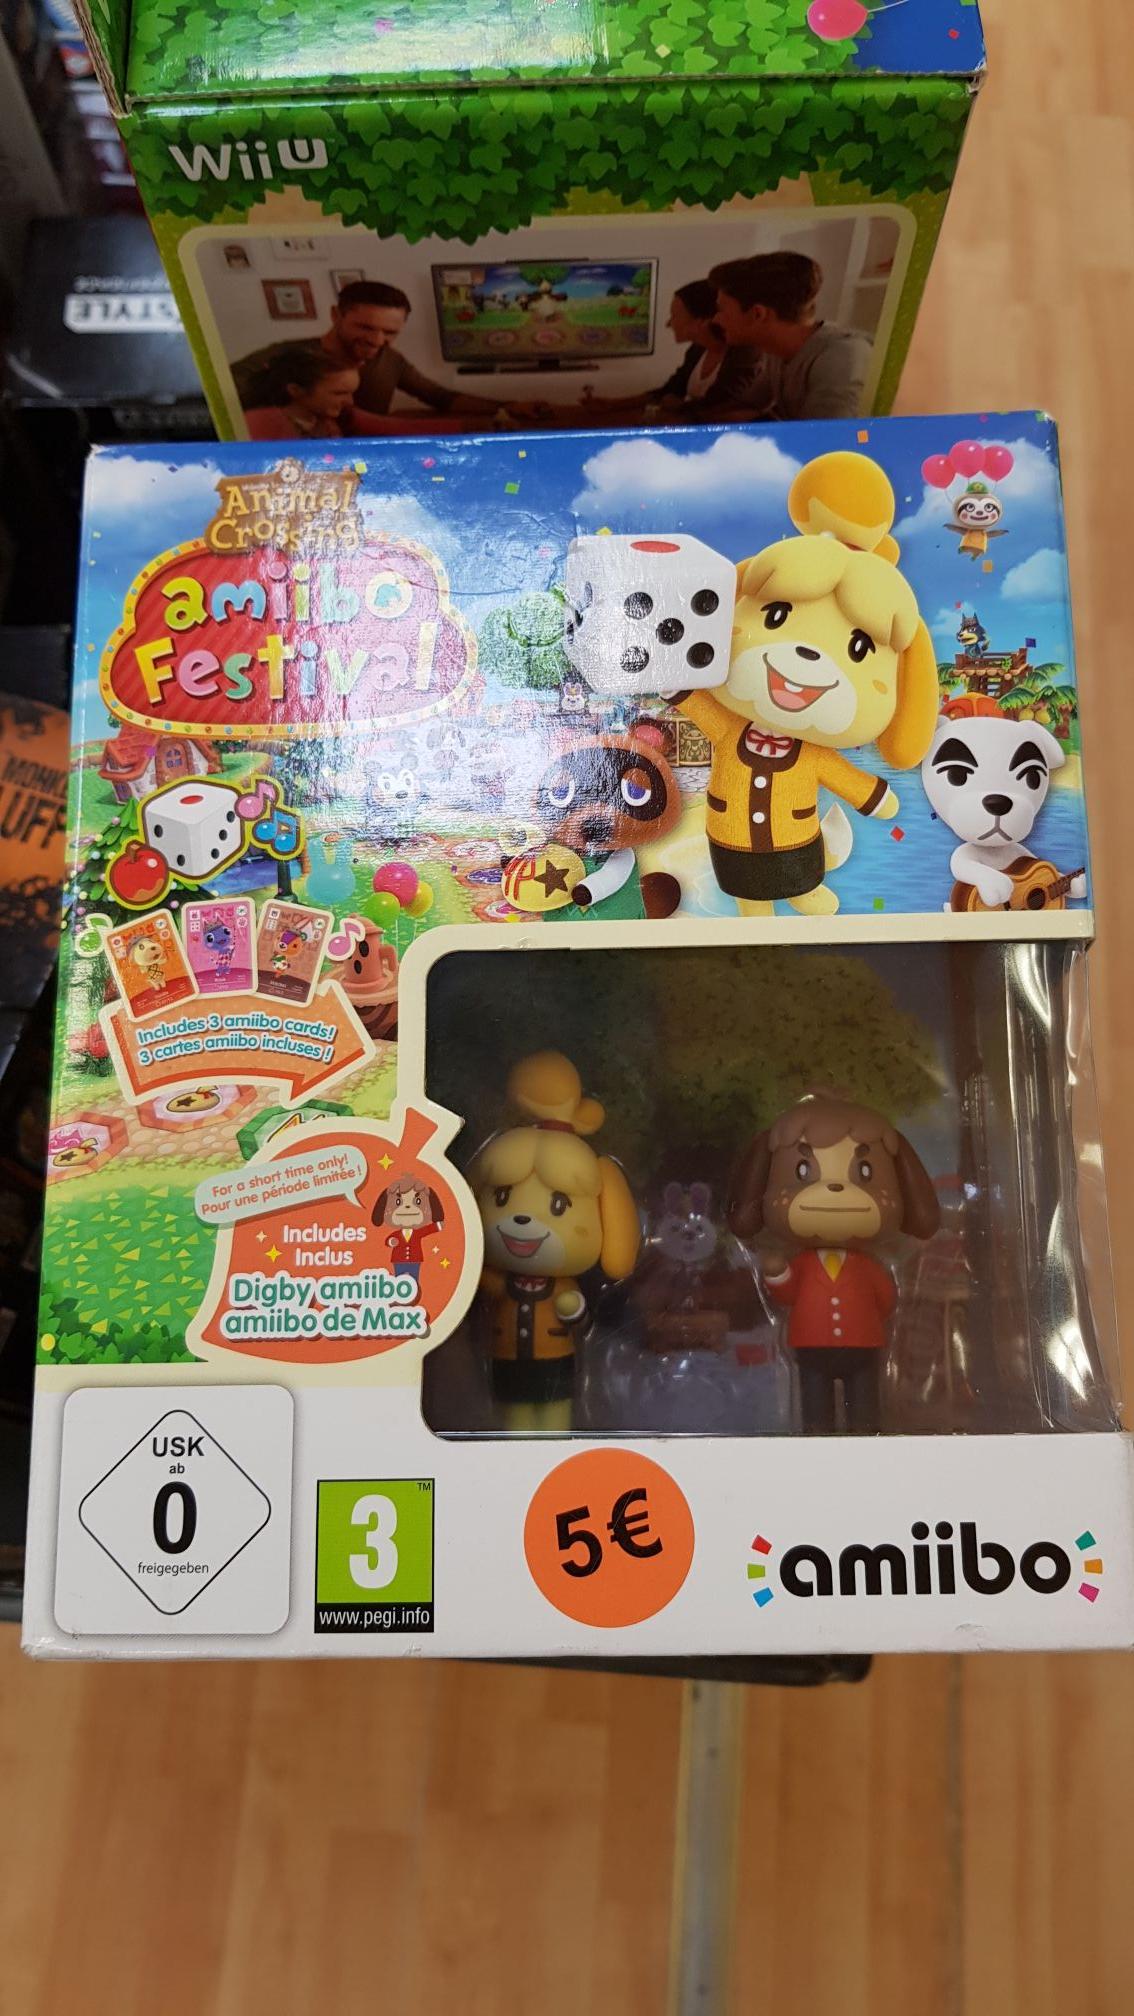 Pack Amiibo Festival : Animal crossing sur Nintendo Wii U + 2 Amiibo - PicWicToys Orvault (44)